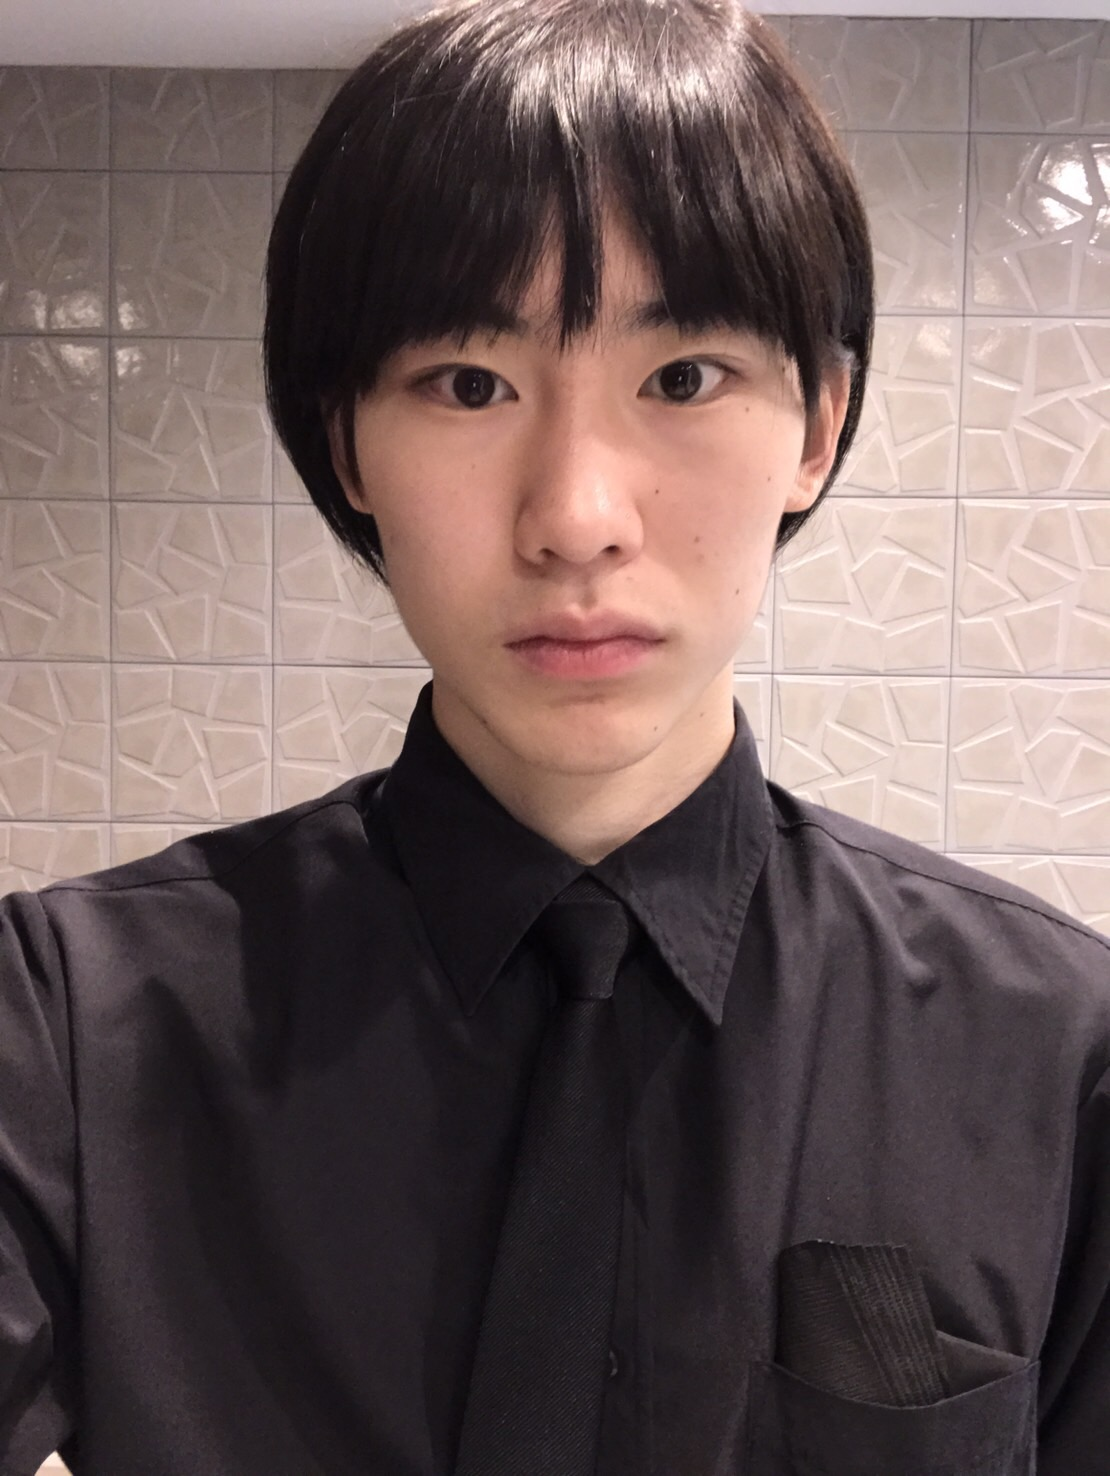 Model Keiju